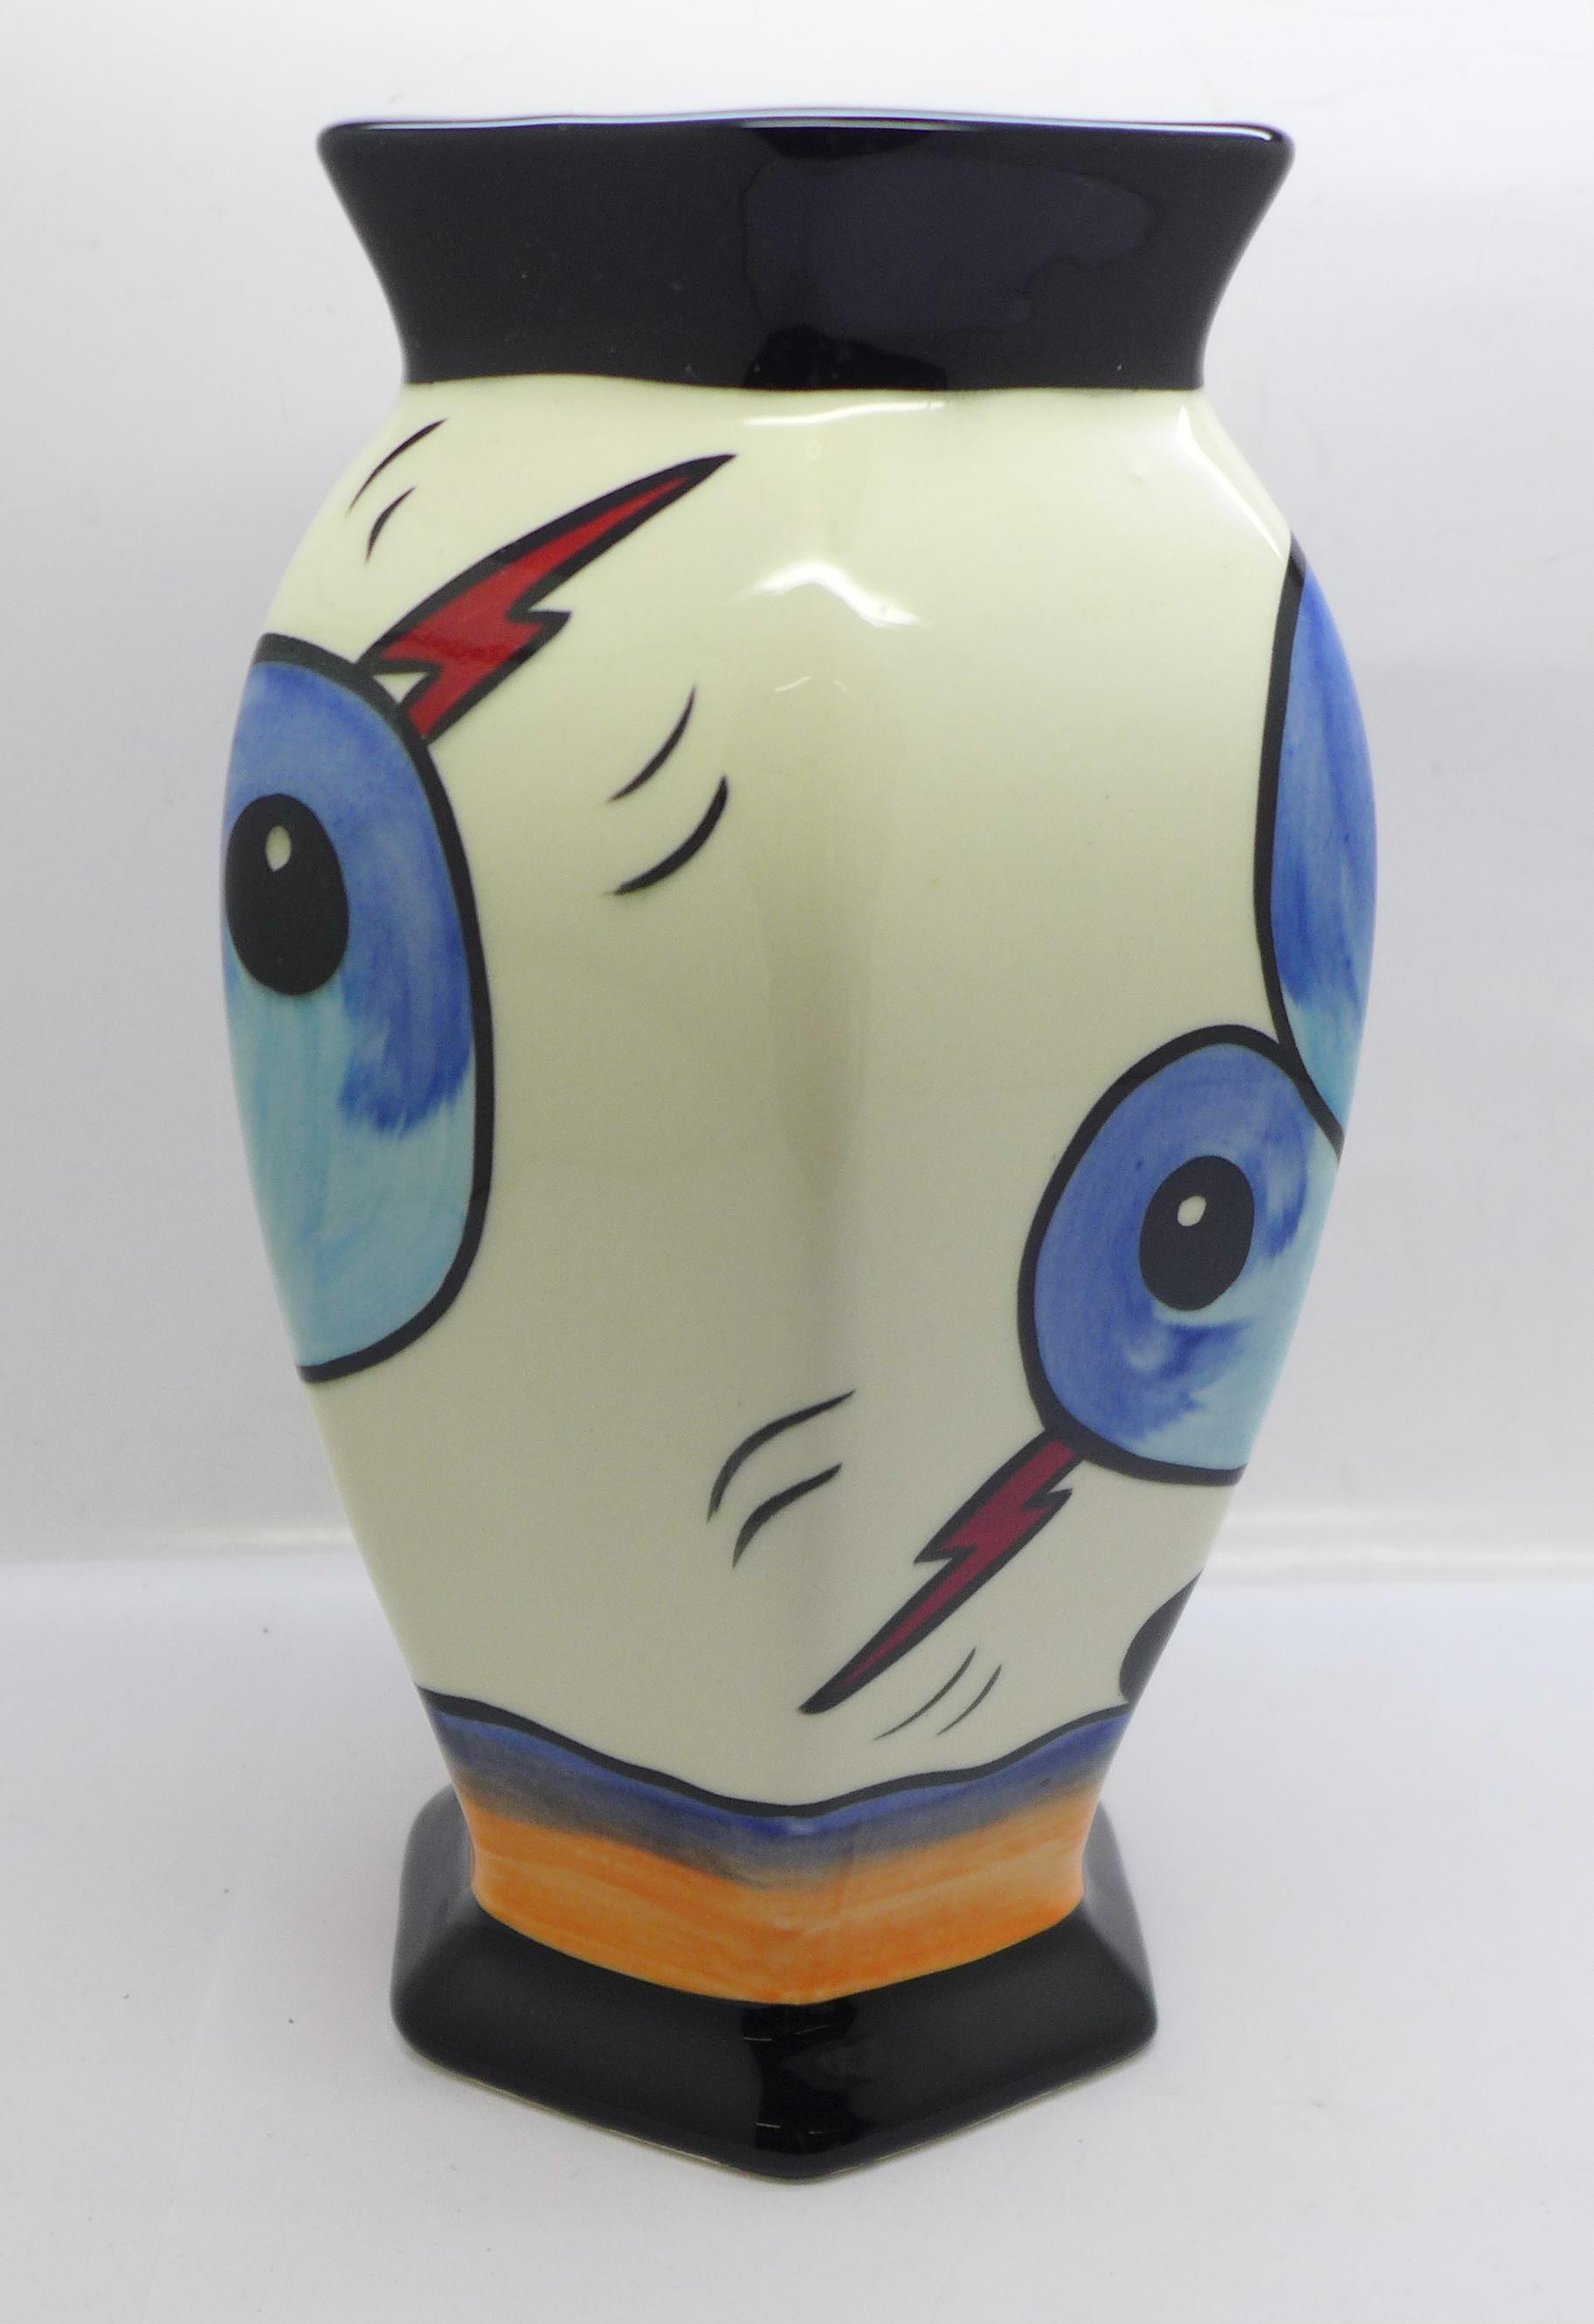 Lorna Bailey Pottery, hexagonal vase in the 'Bursley Way' design, 'Lorna Bailey' signature on the - Image 2 of 5